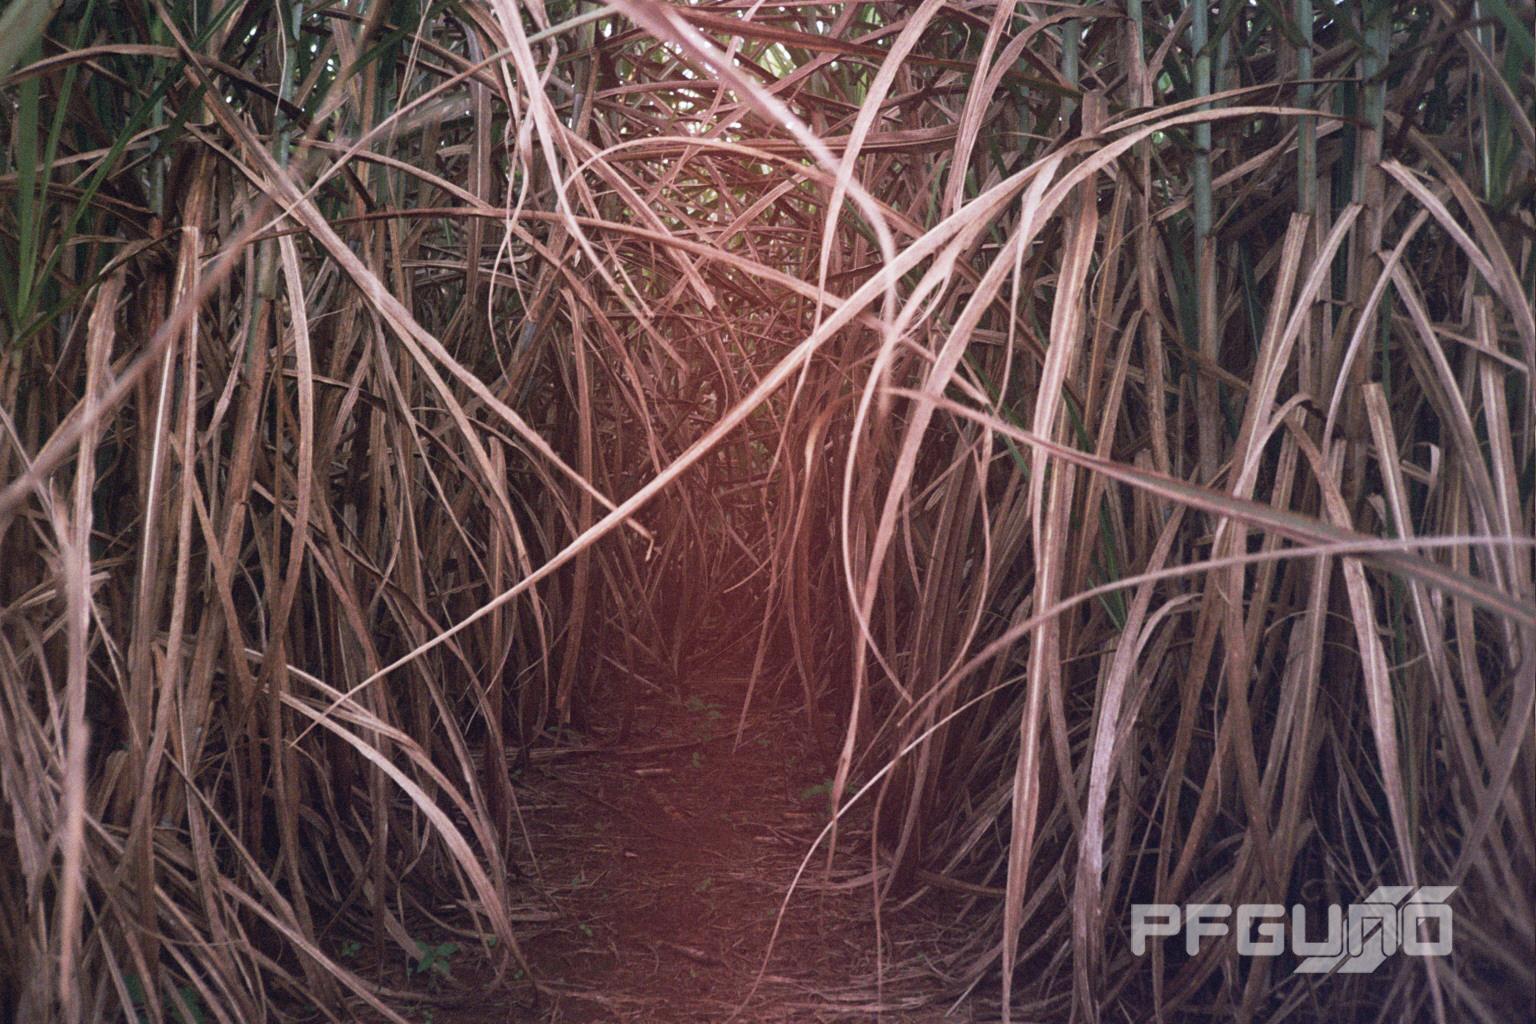 Between The Sugarcane